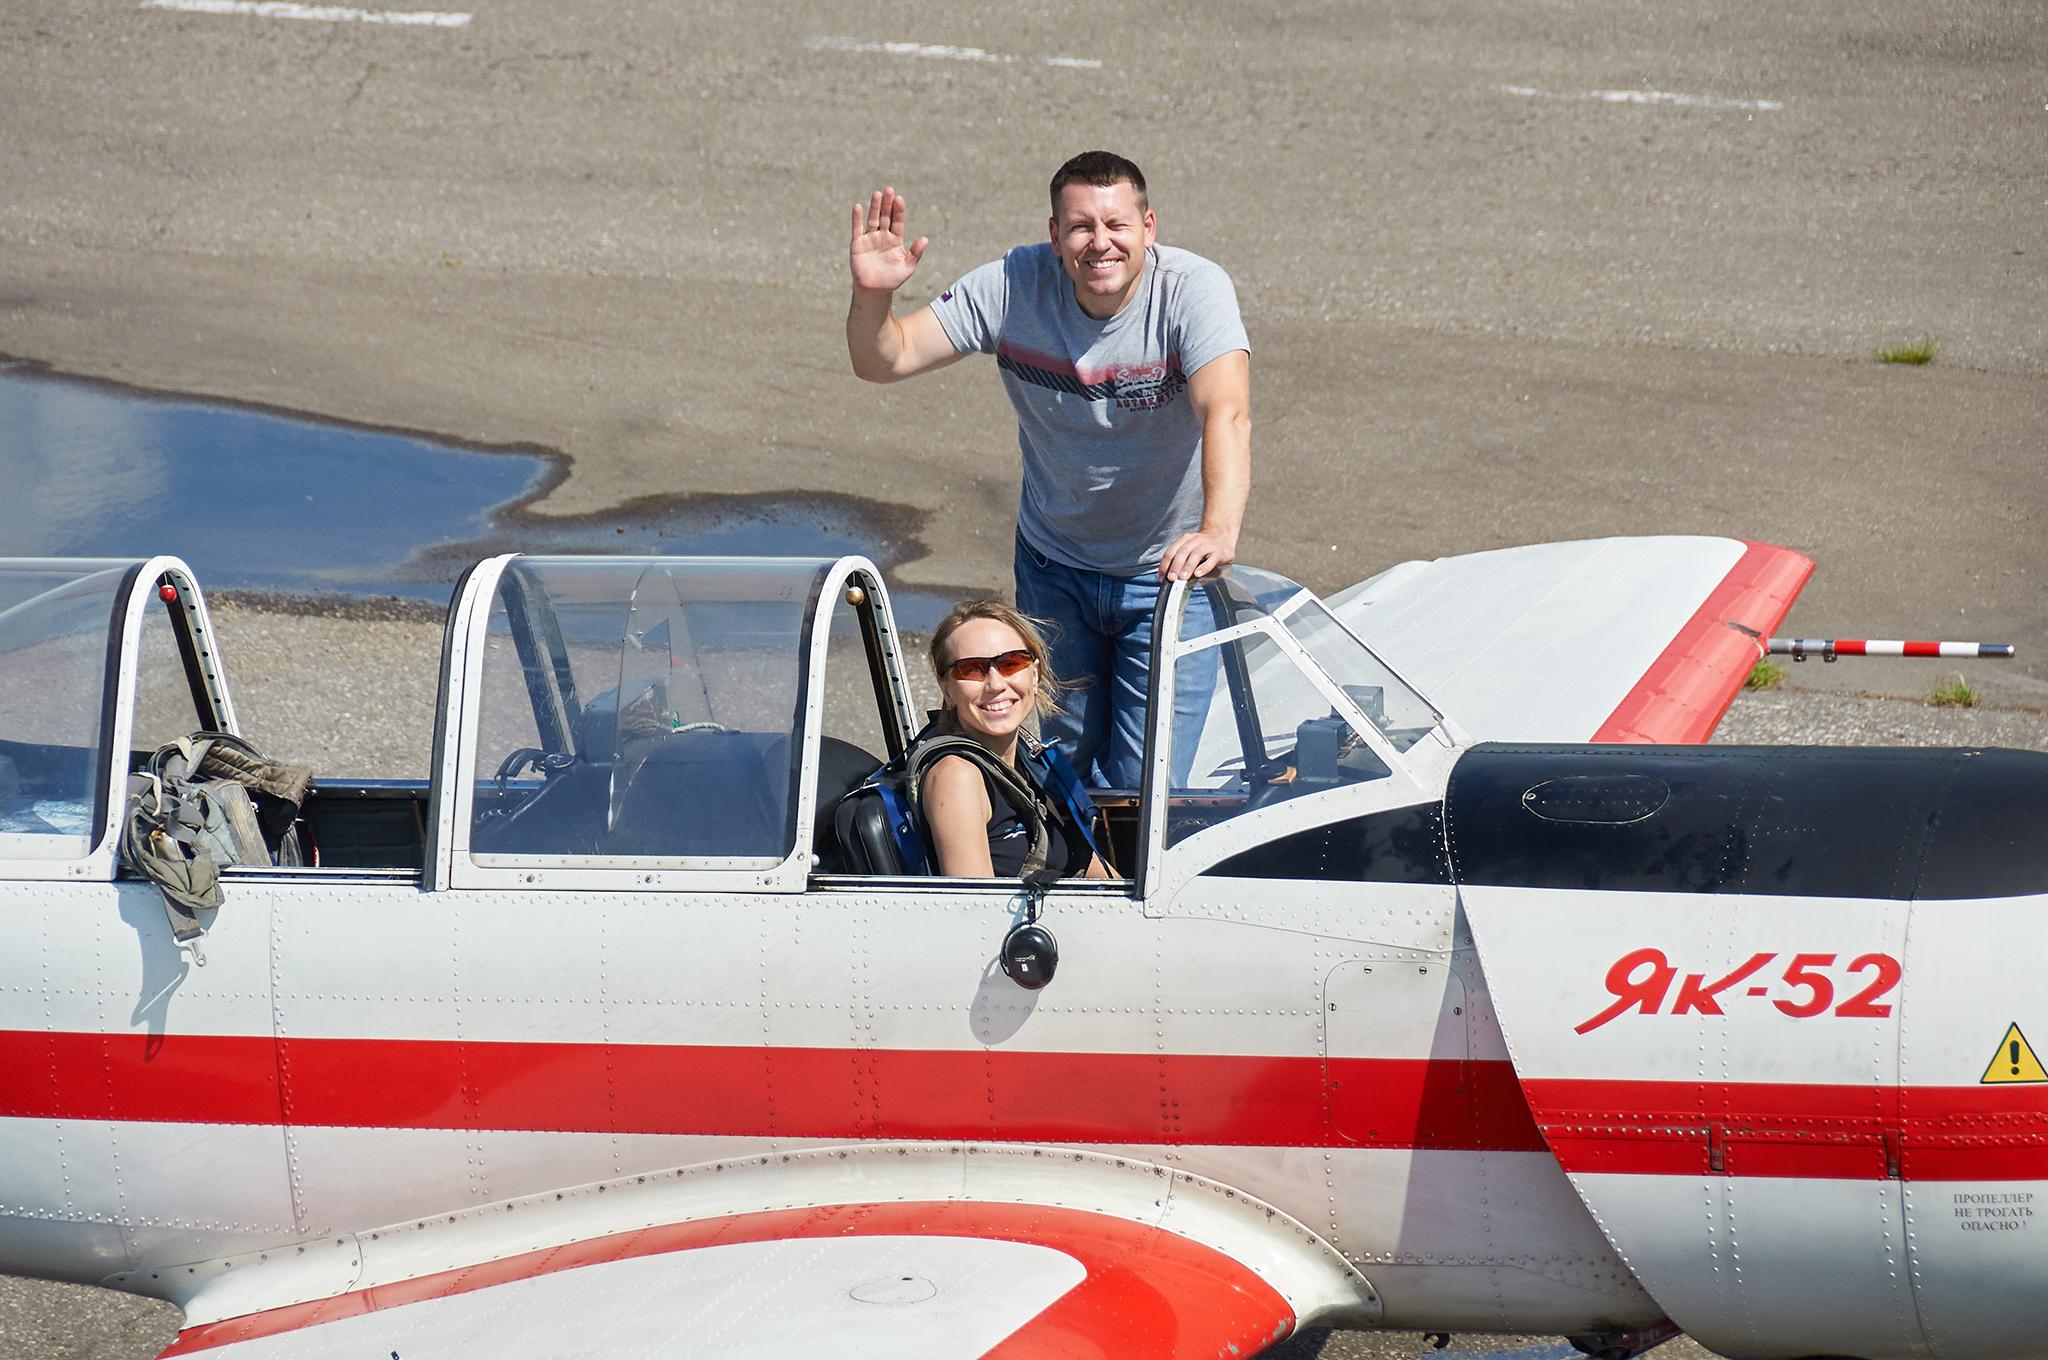 More from my first training day in the Yak-52 - Ещё о моём первом тренировочном дне на Як-52